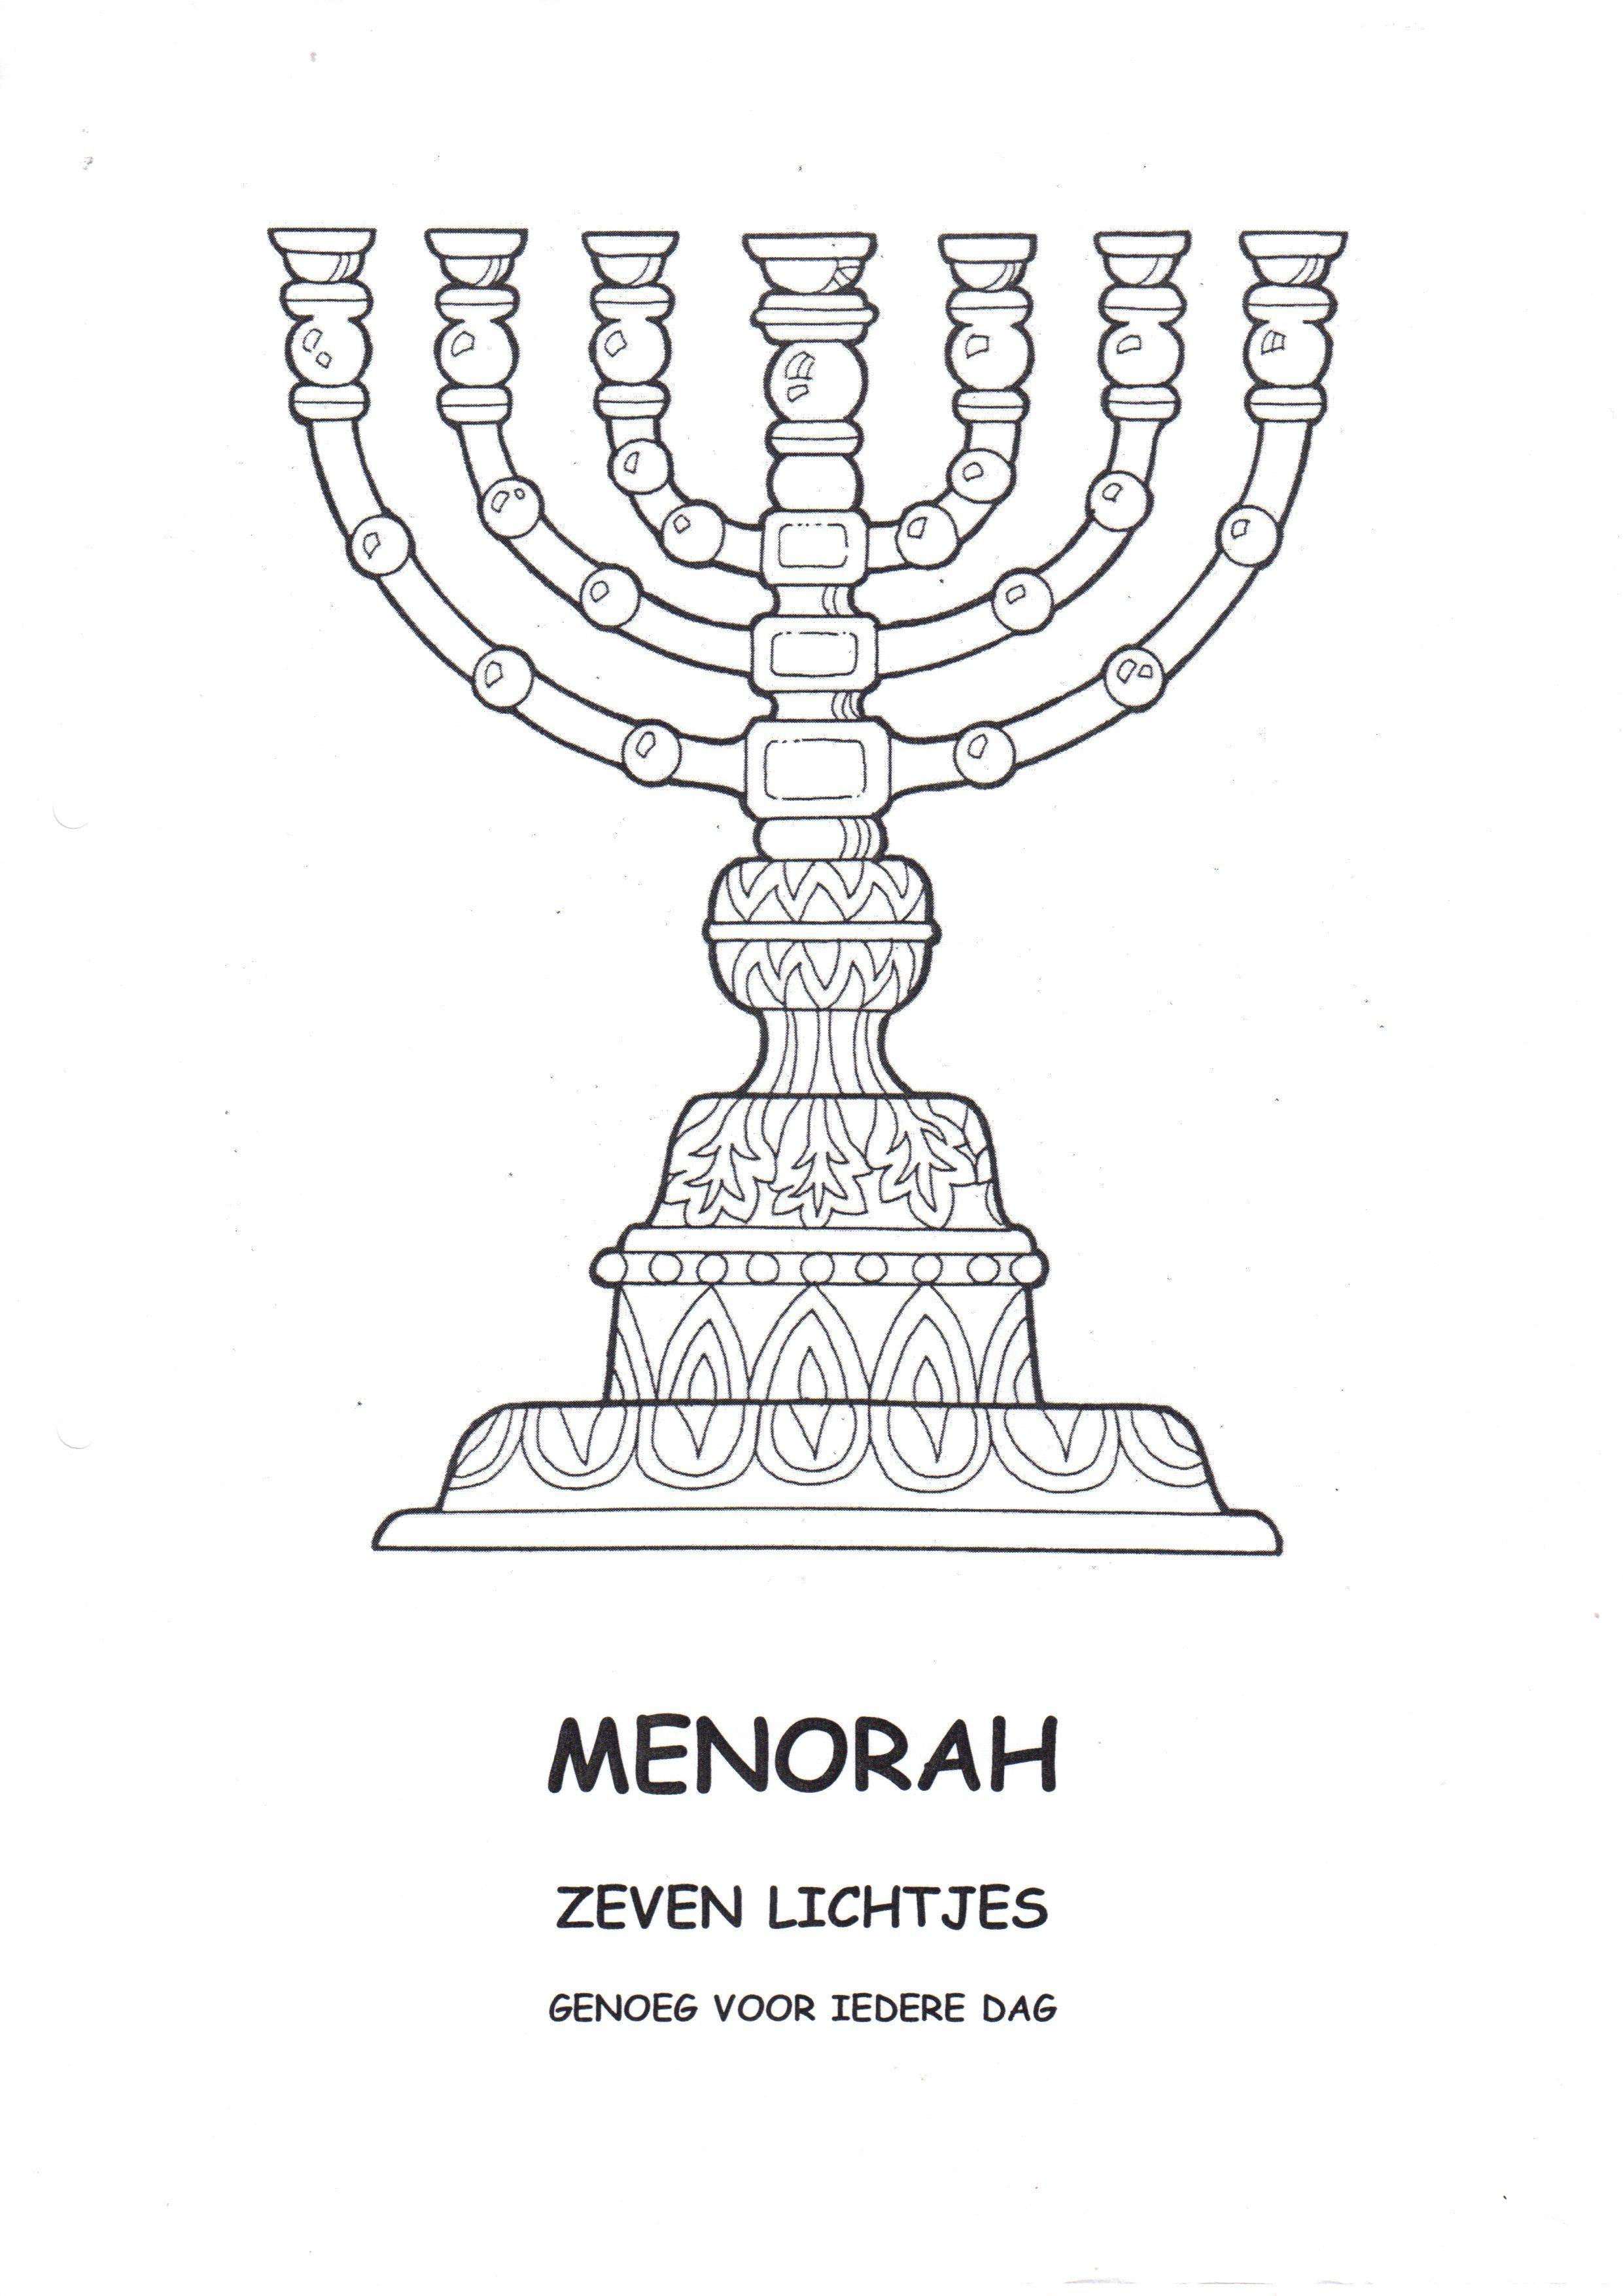 Pin de Heather McCary en Bible OT: Moses Adult Life/ Leadership in ...